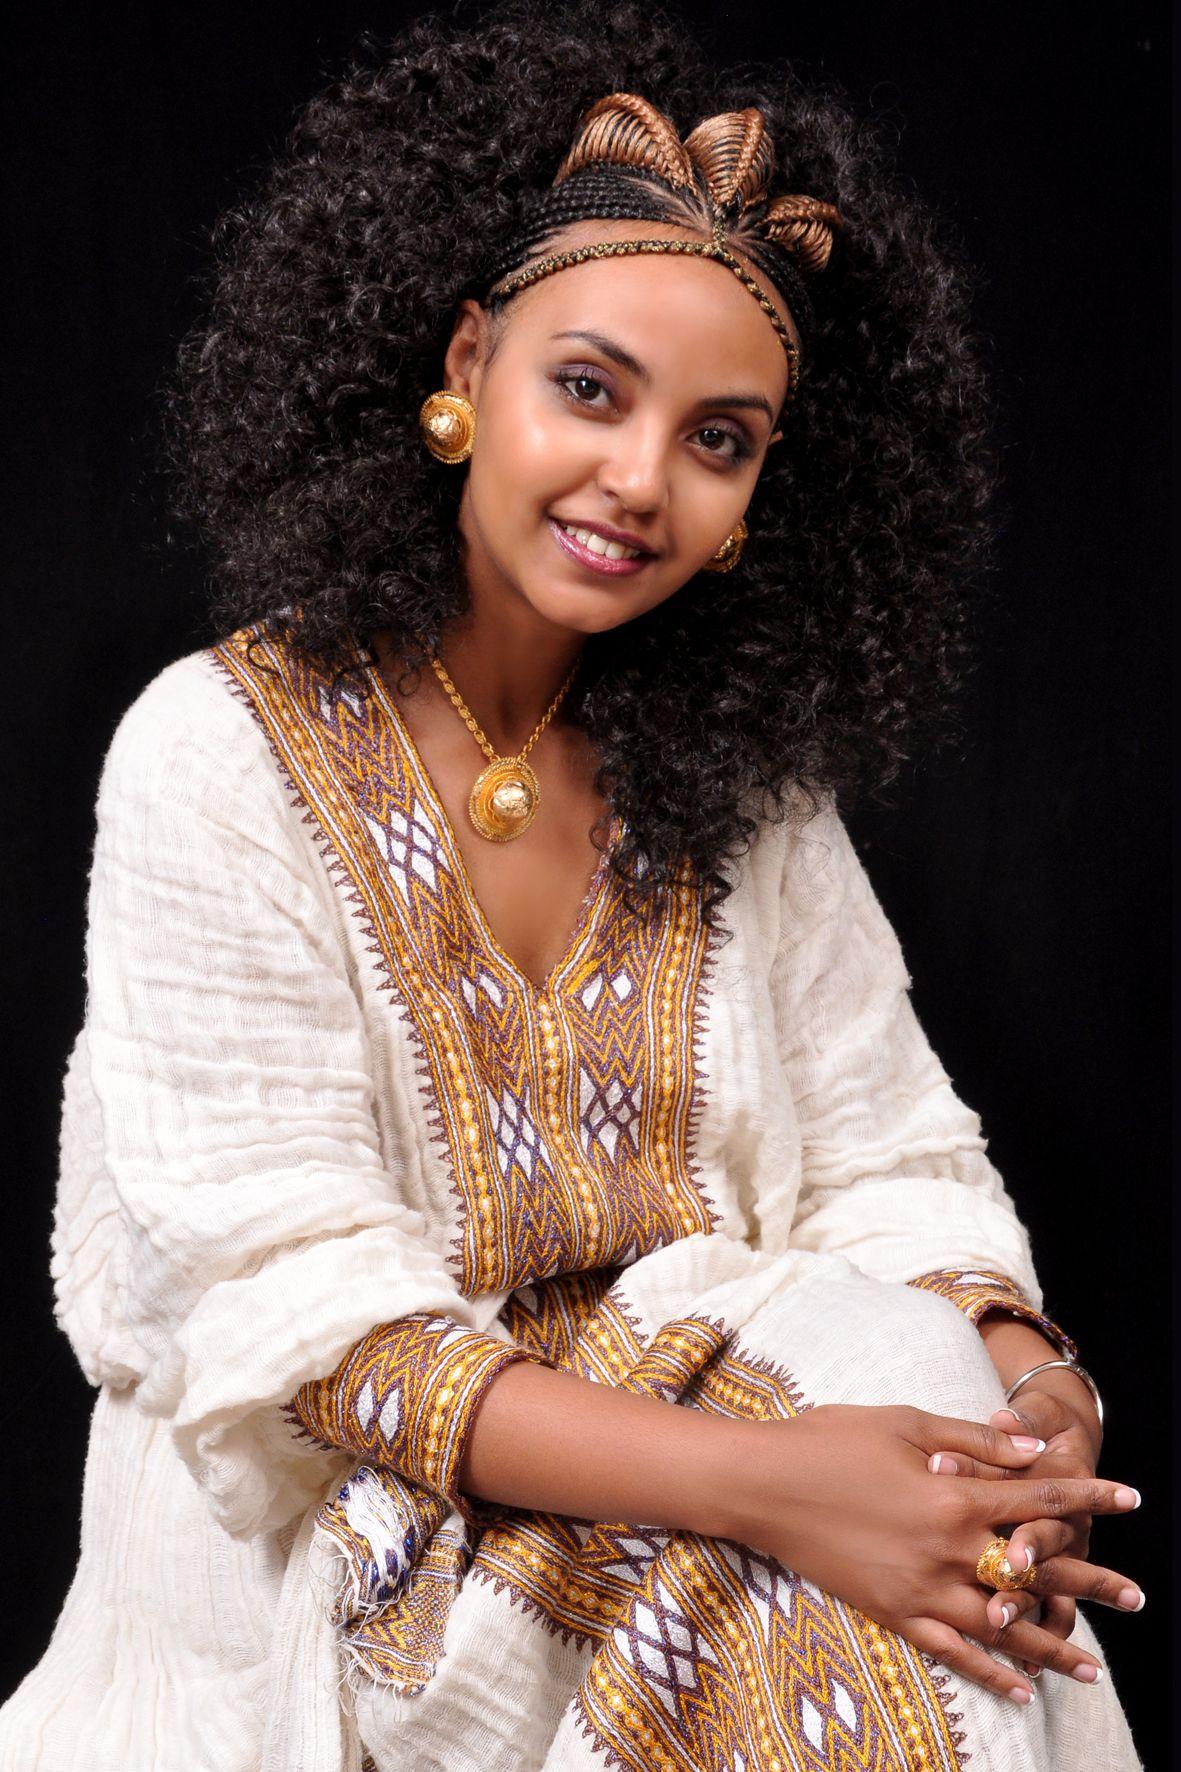 Eritrean cultural dress my inspiration